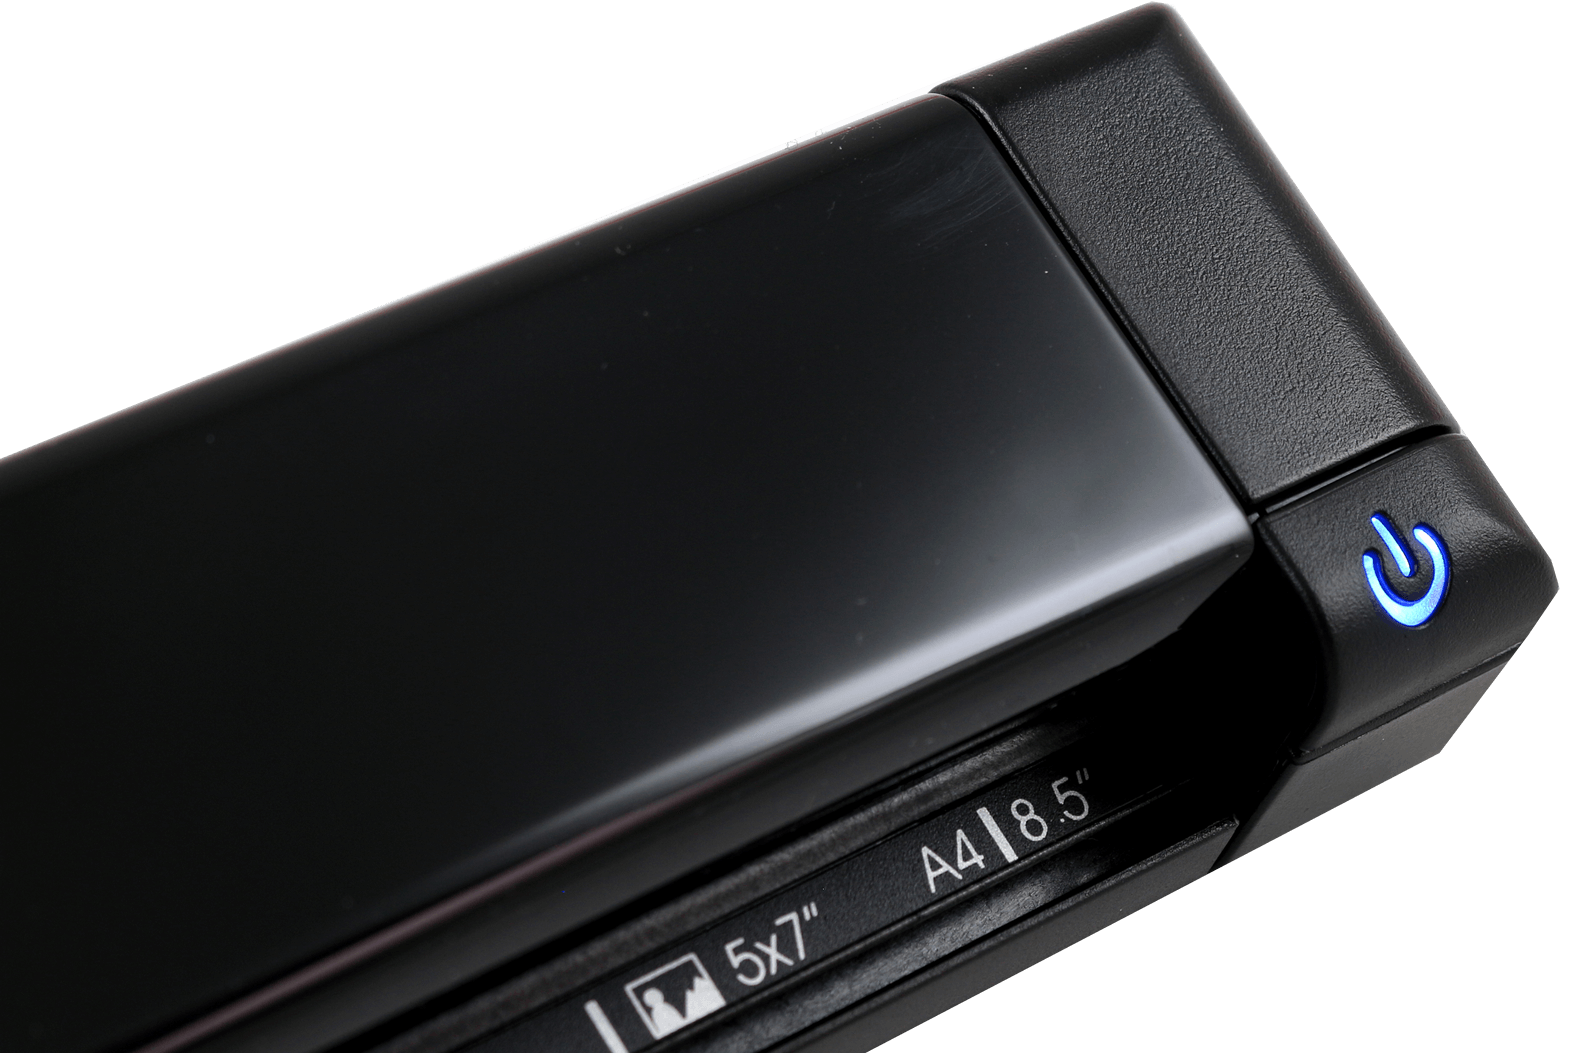 IRIScan Express 4 USB Portable 1200 dpi Scanner